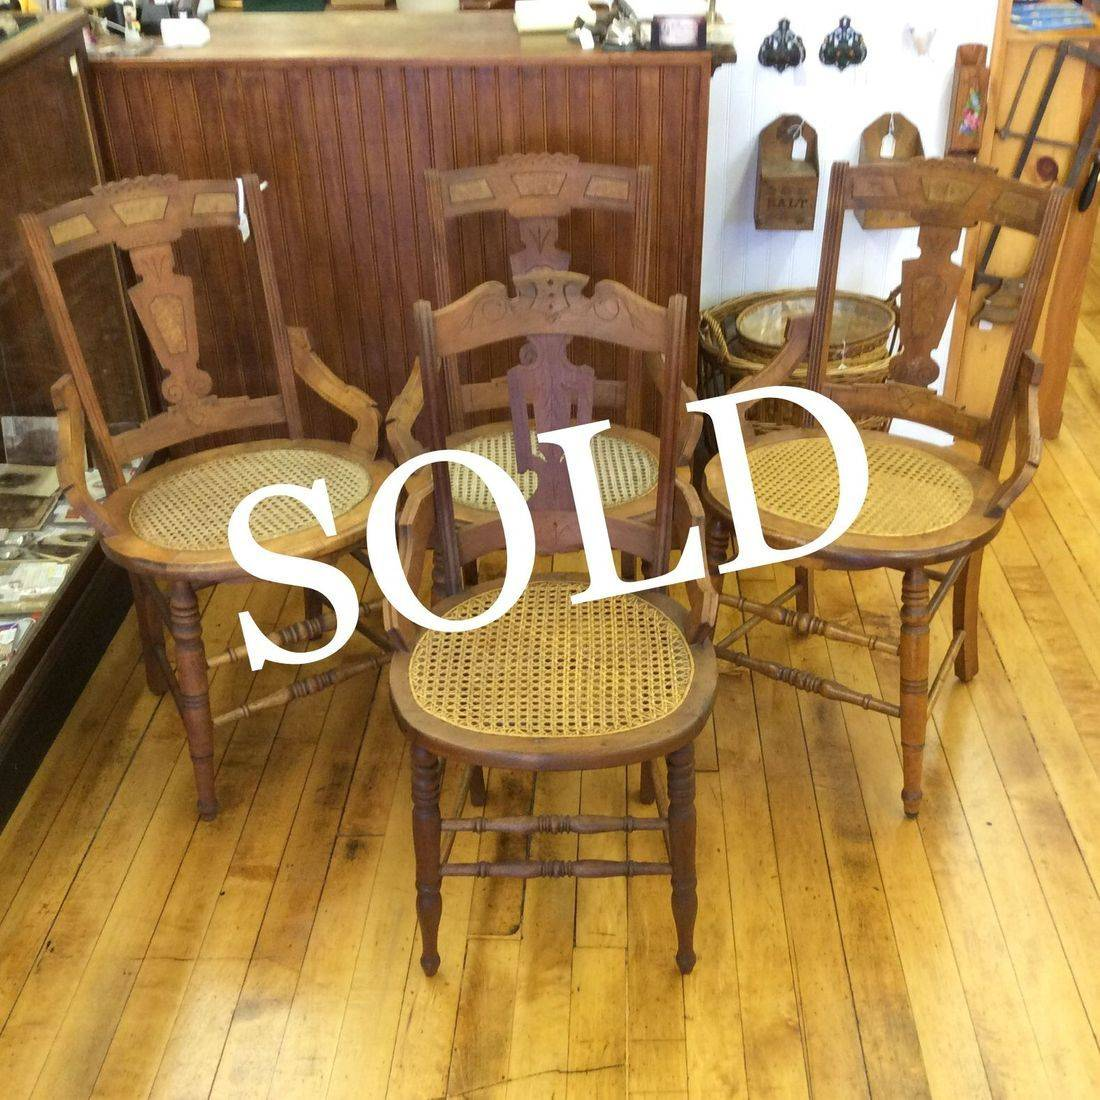 1890-1910 Eastlake Walnut Chairs w/Burled Backs and Cane Seats   $30.00 each